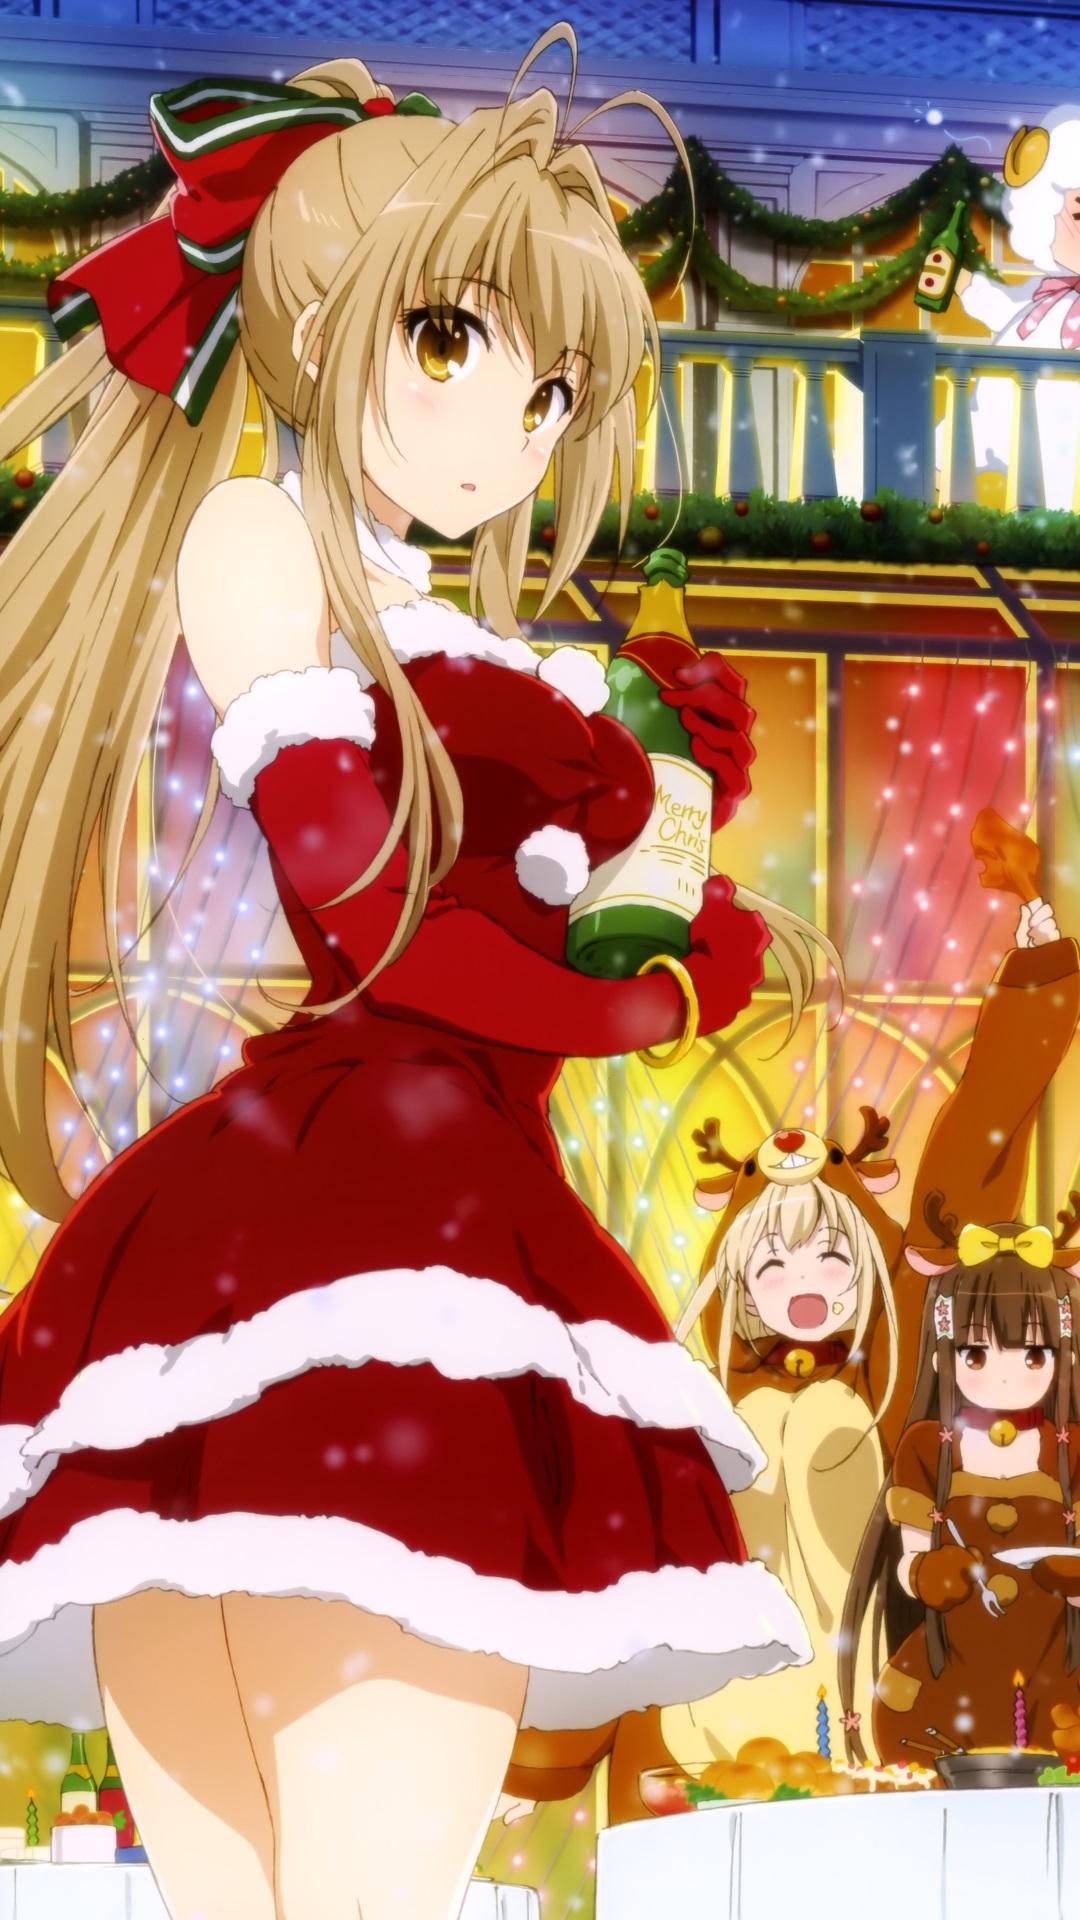 Serafall 39 s profile - Anime girl christmas wallpaper ...